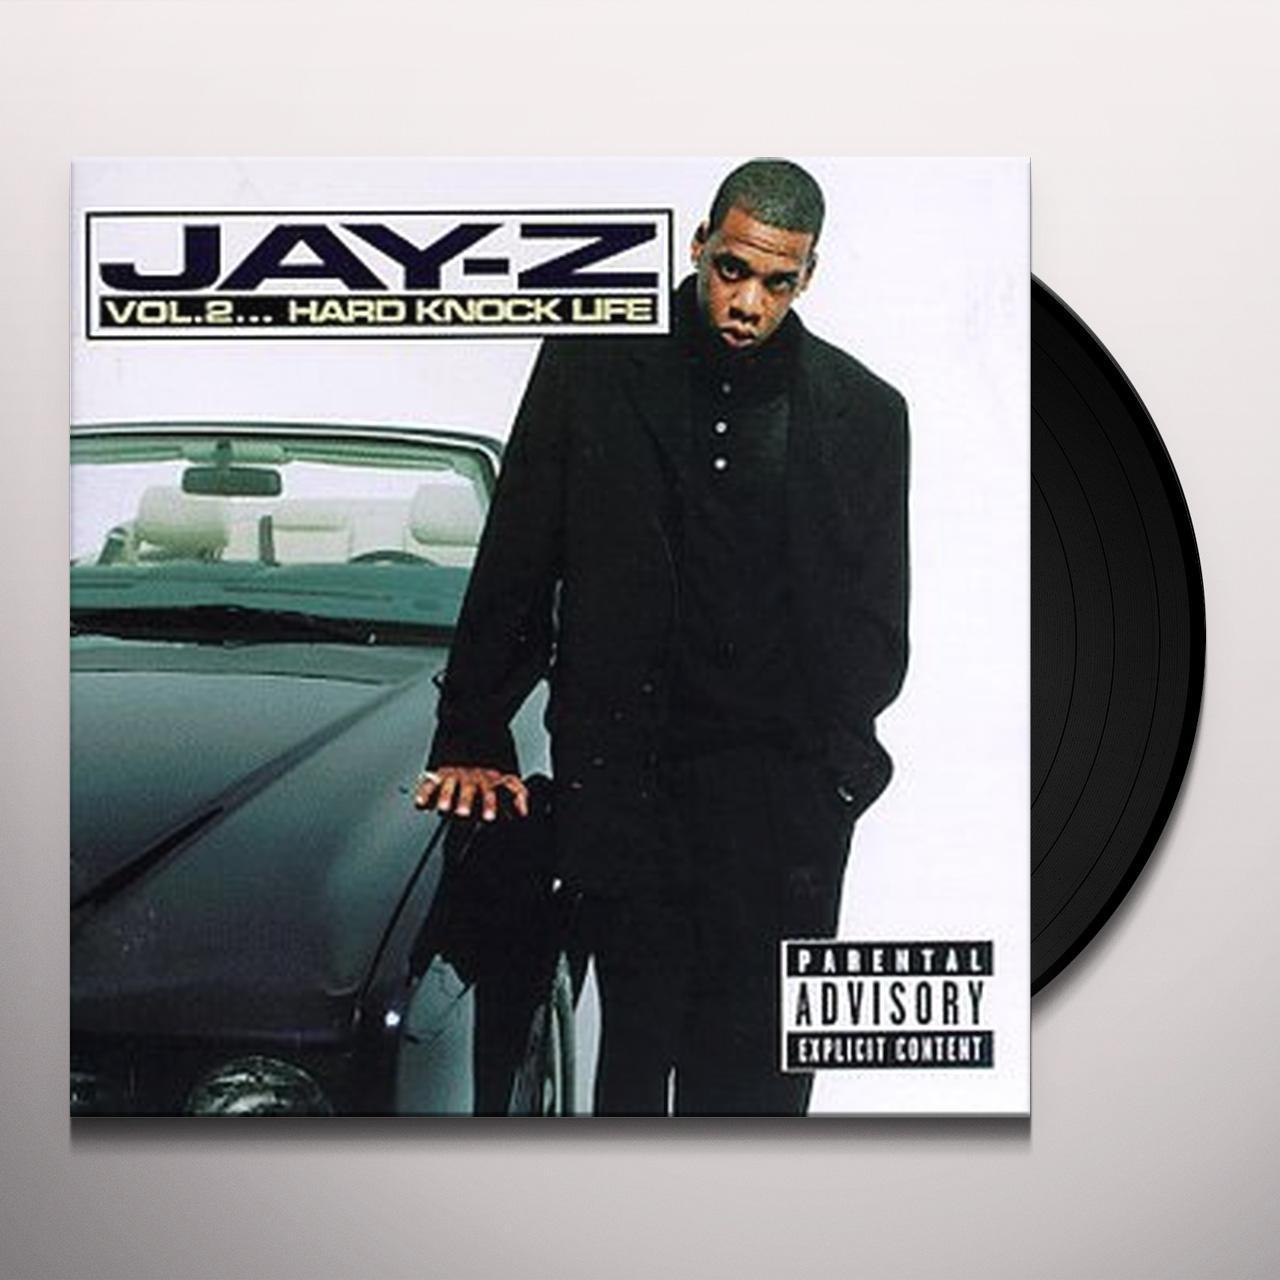 Jay z volume 2 hard knock life vinyl record jay z volume 2 hard knock life vinyl record hover to zoom malvernweather Image collections